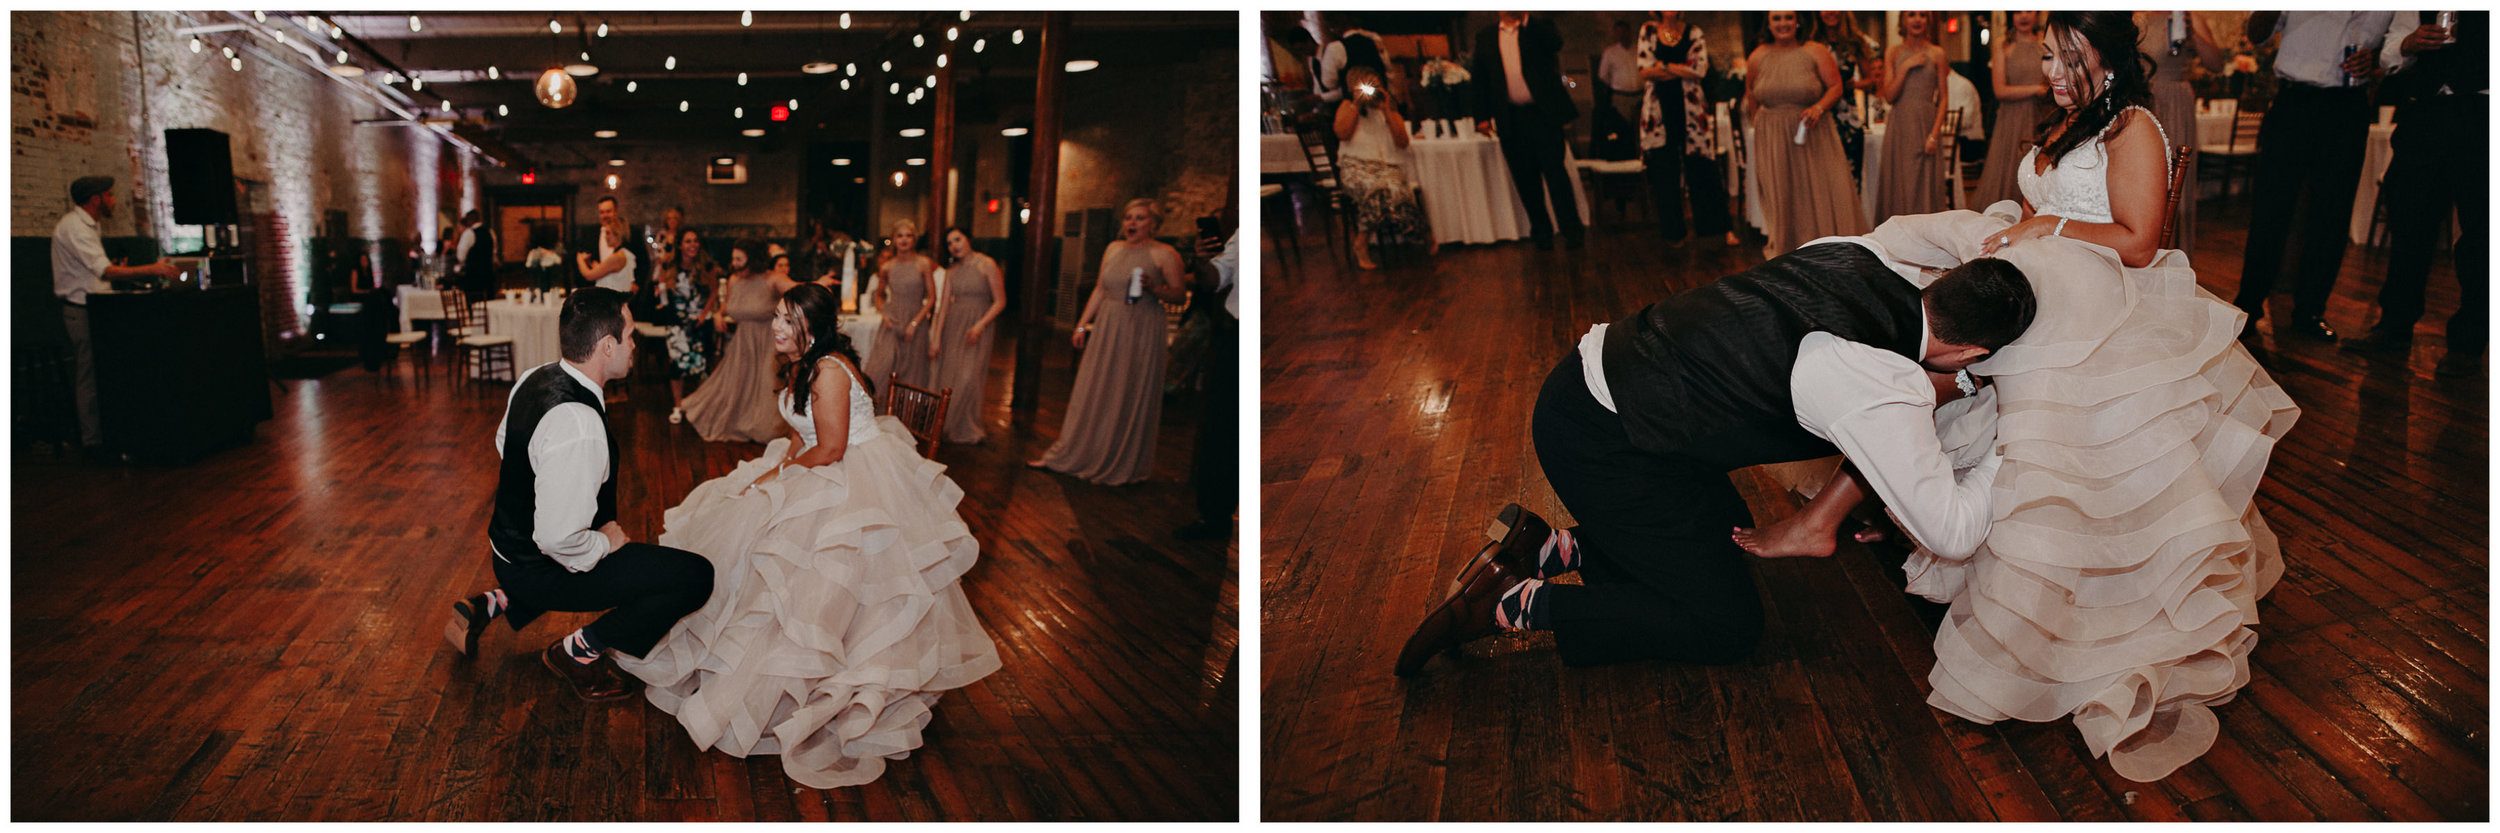 72 - Atlanta Wedding Photographer - The engine room - Ga - Wedding trends - Aline Marin Photography.jpg